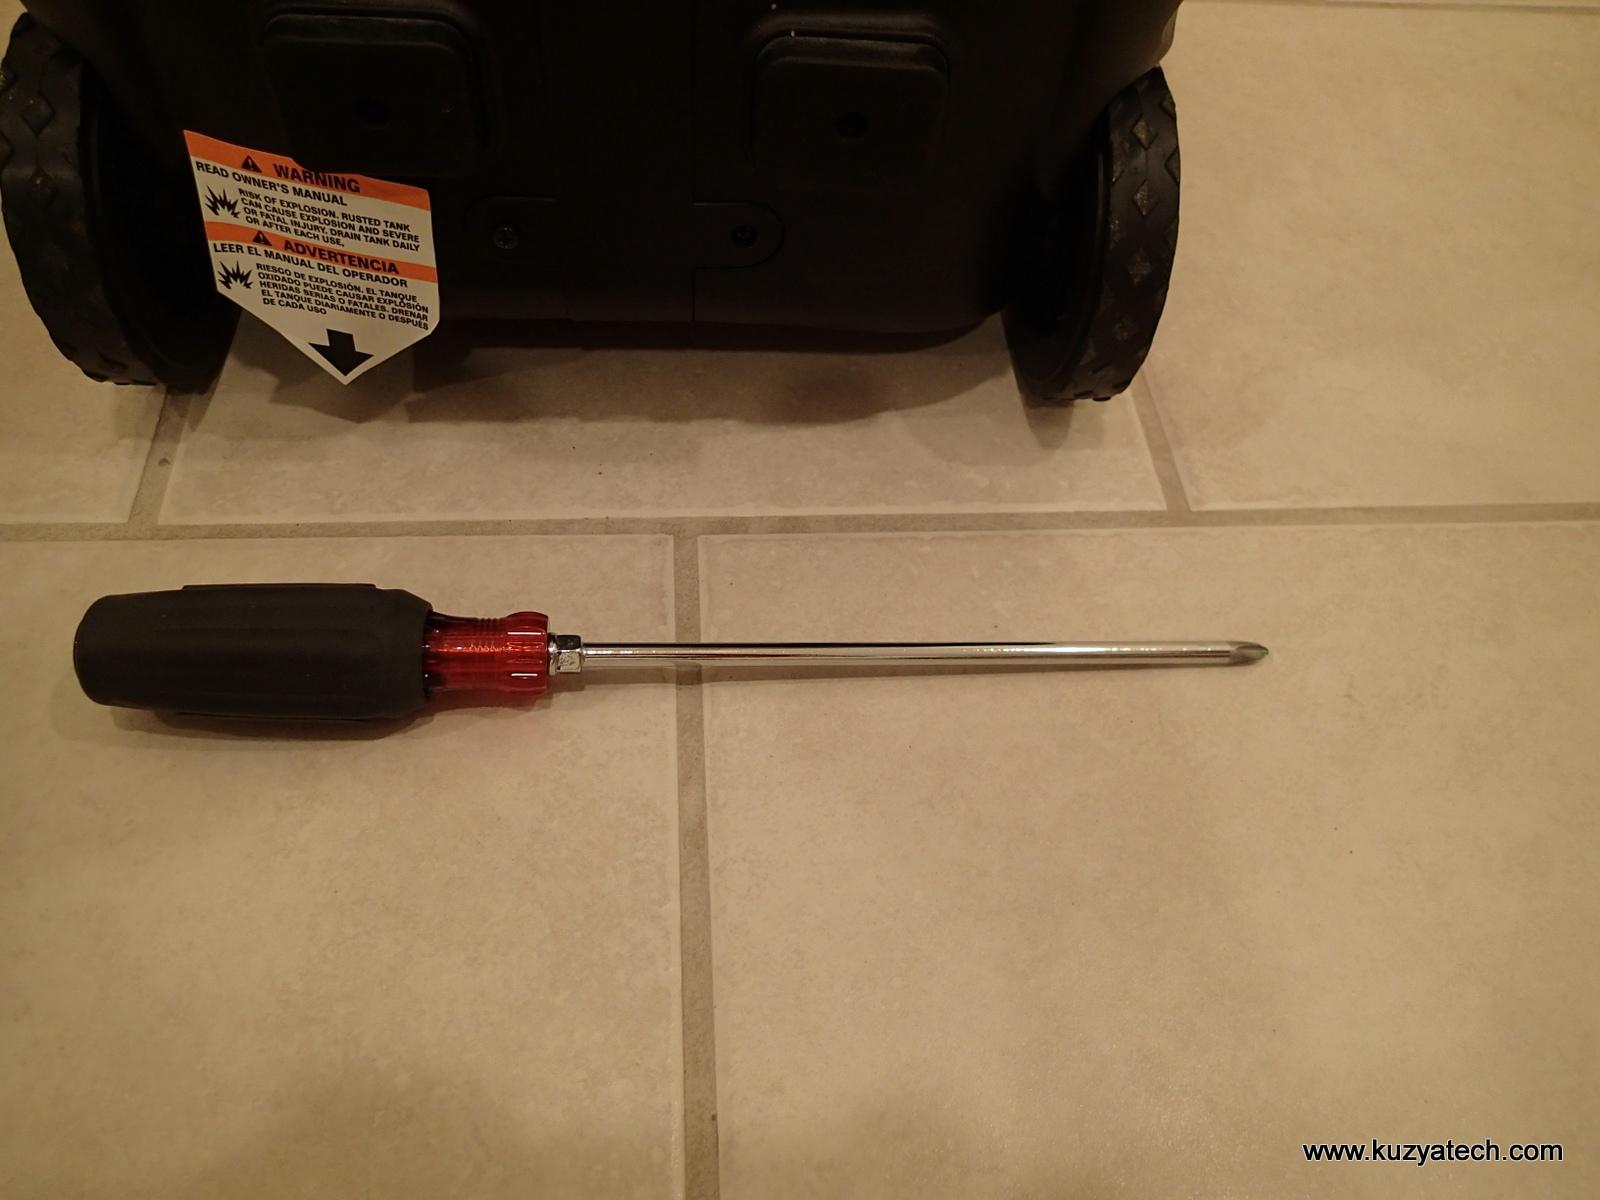 Long screwdriver is needed